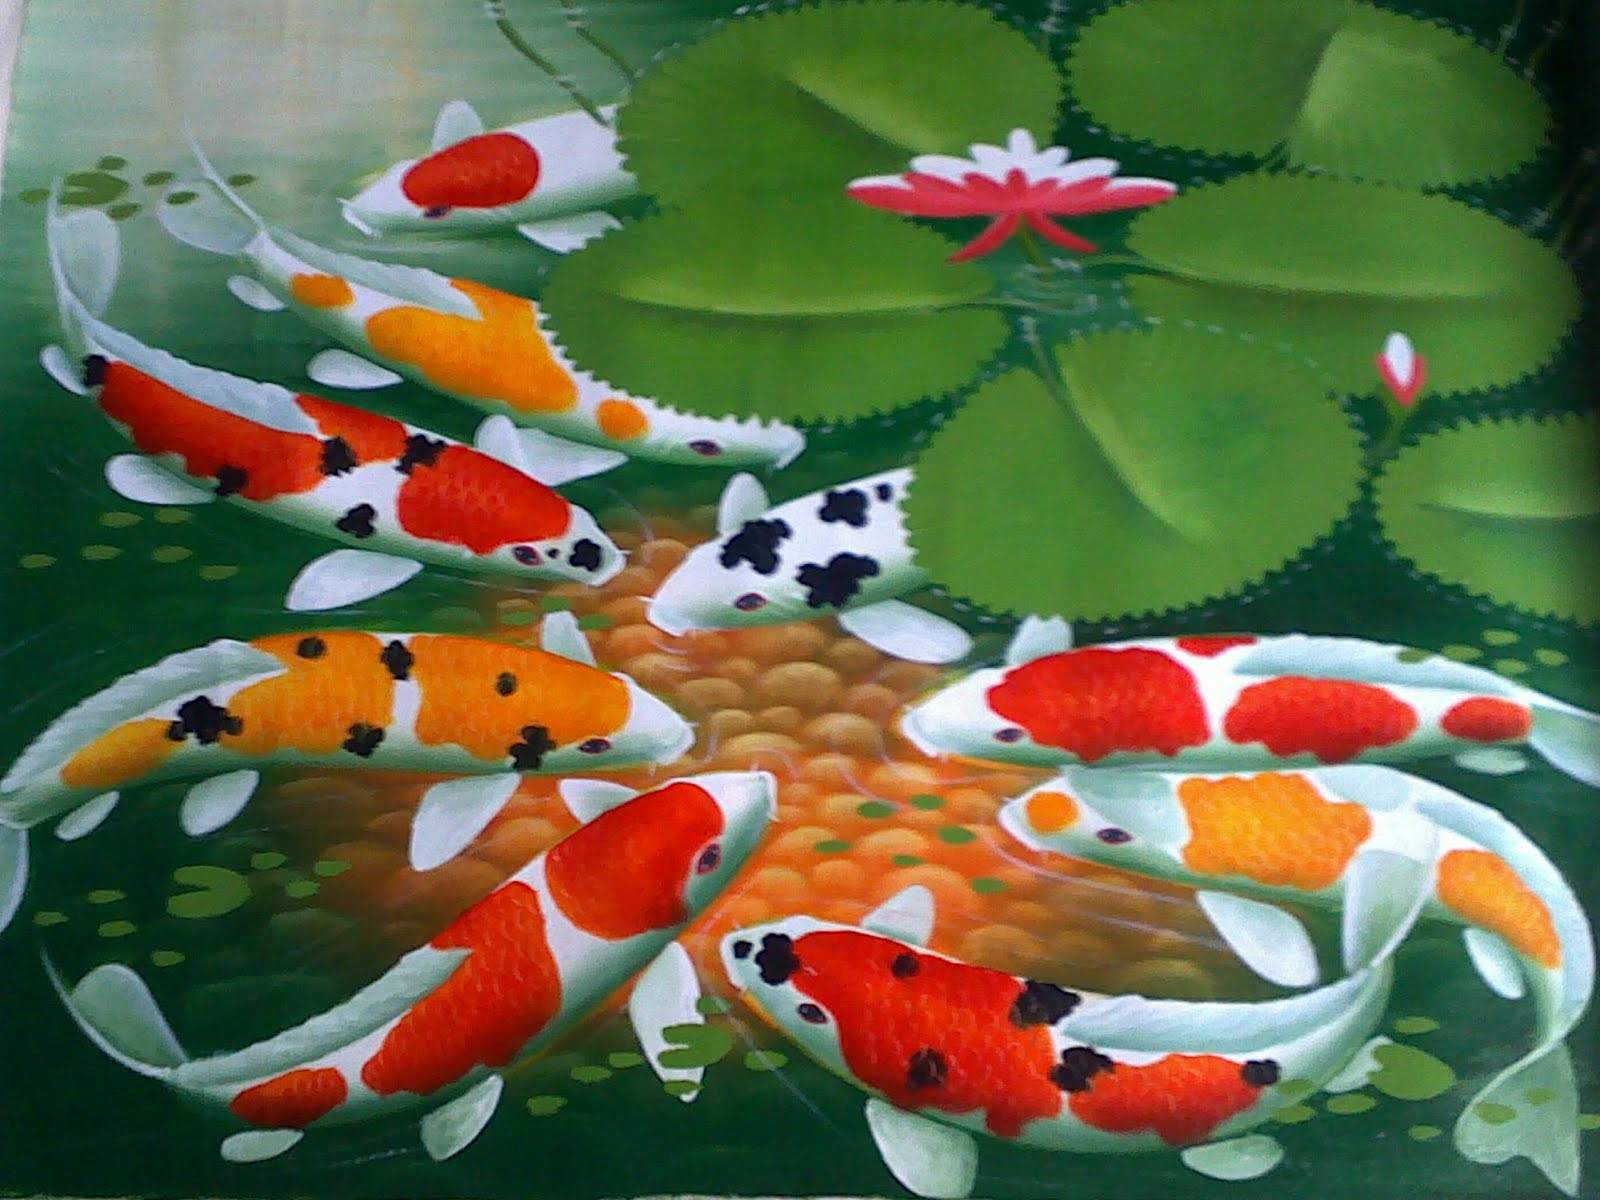 Carpa pesce immagini italiano tipi di acqua dolce e for Koi fish images